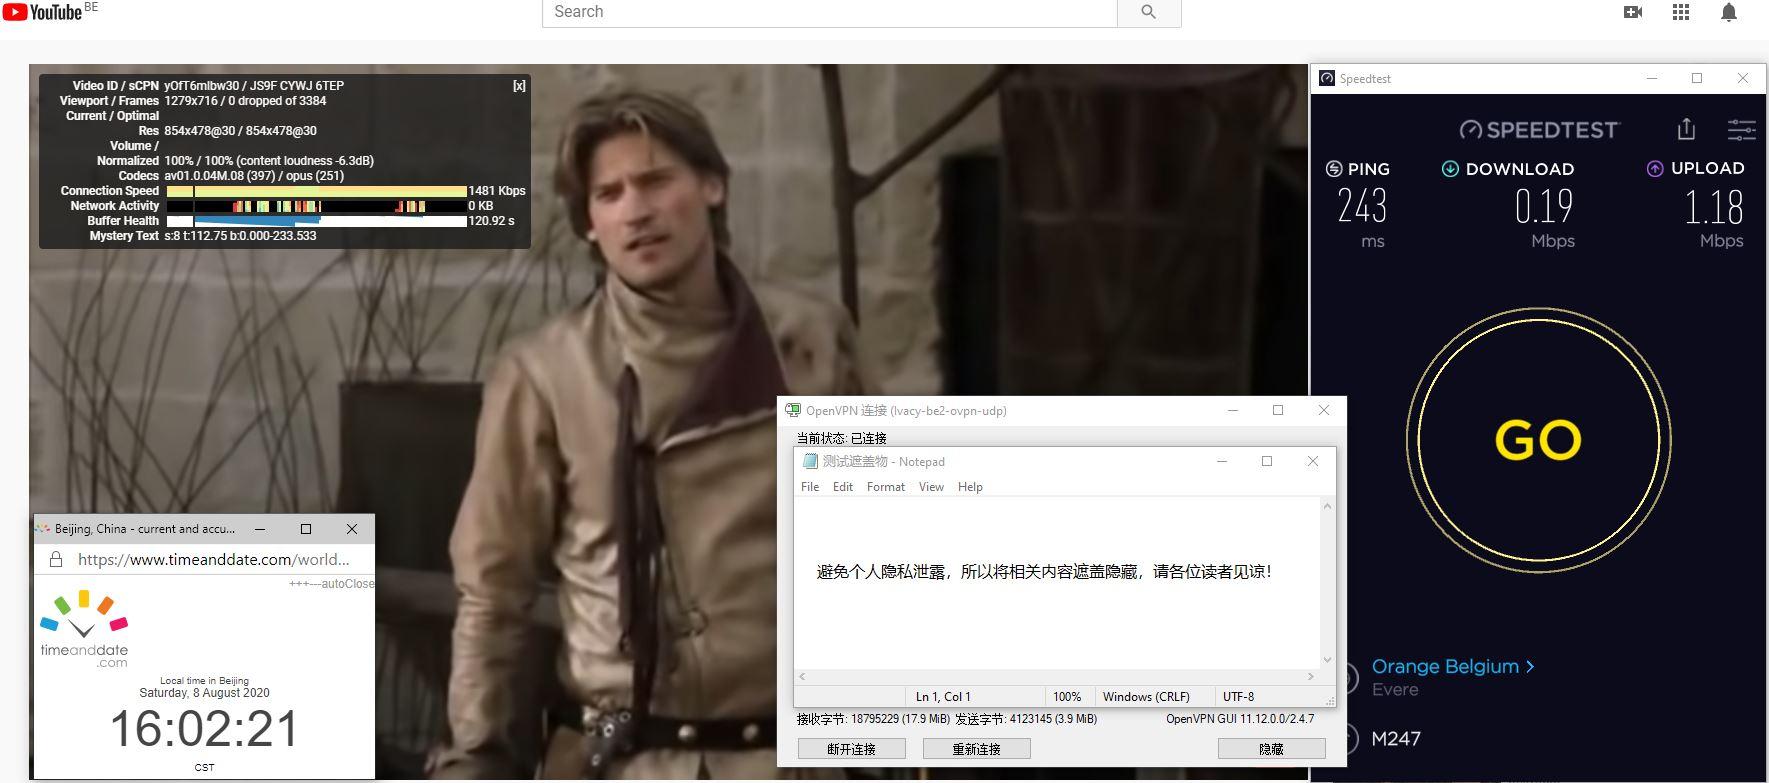 Windows10 IvacyVPN OpenVPN GUI be2 中国VPN 翻墙 科学上网 翻墙速度测试 - 20200808